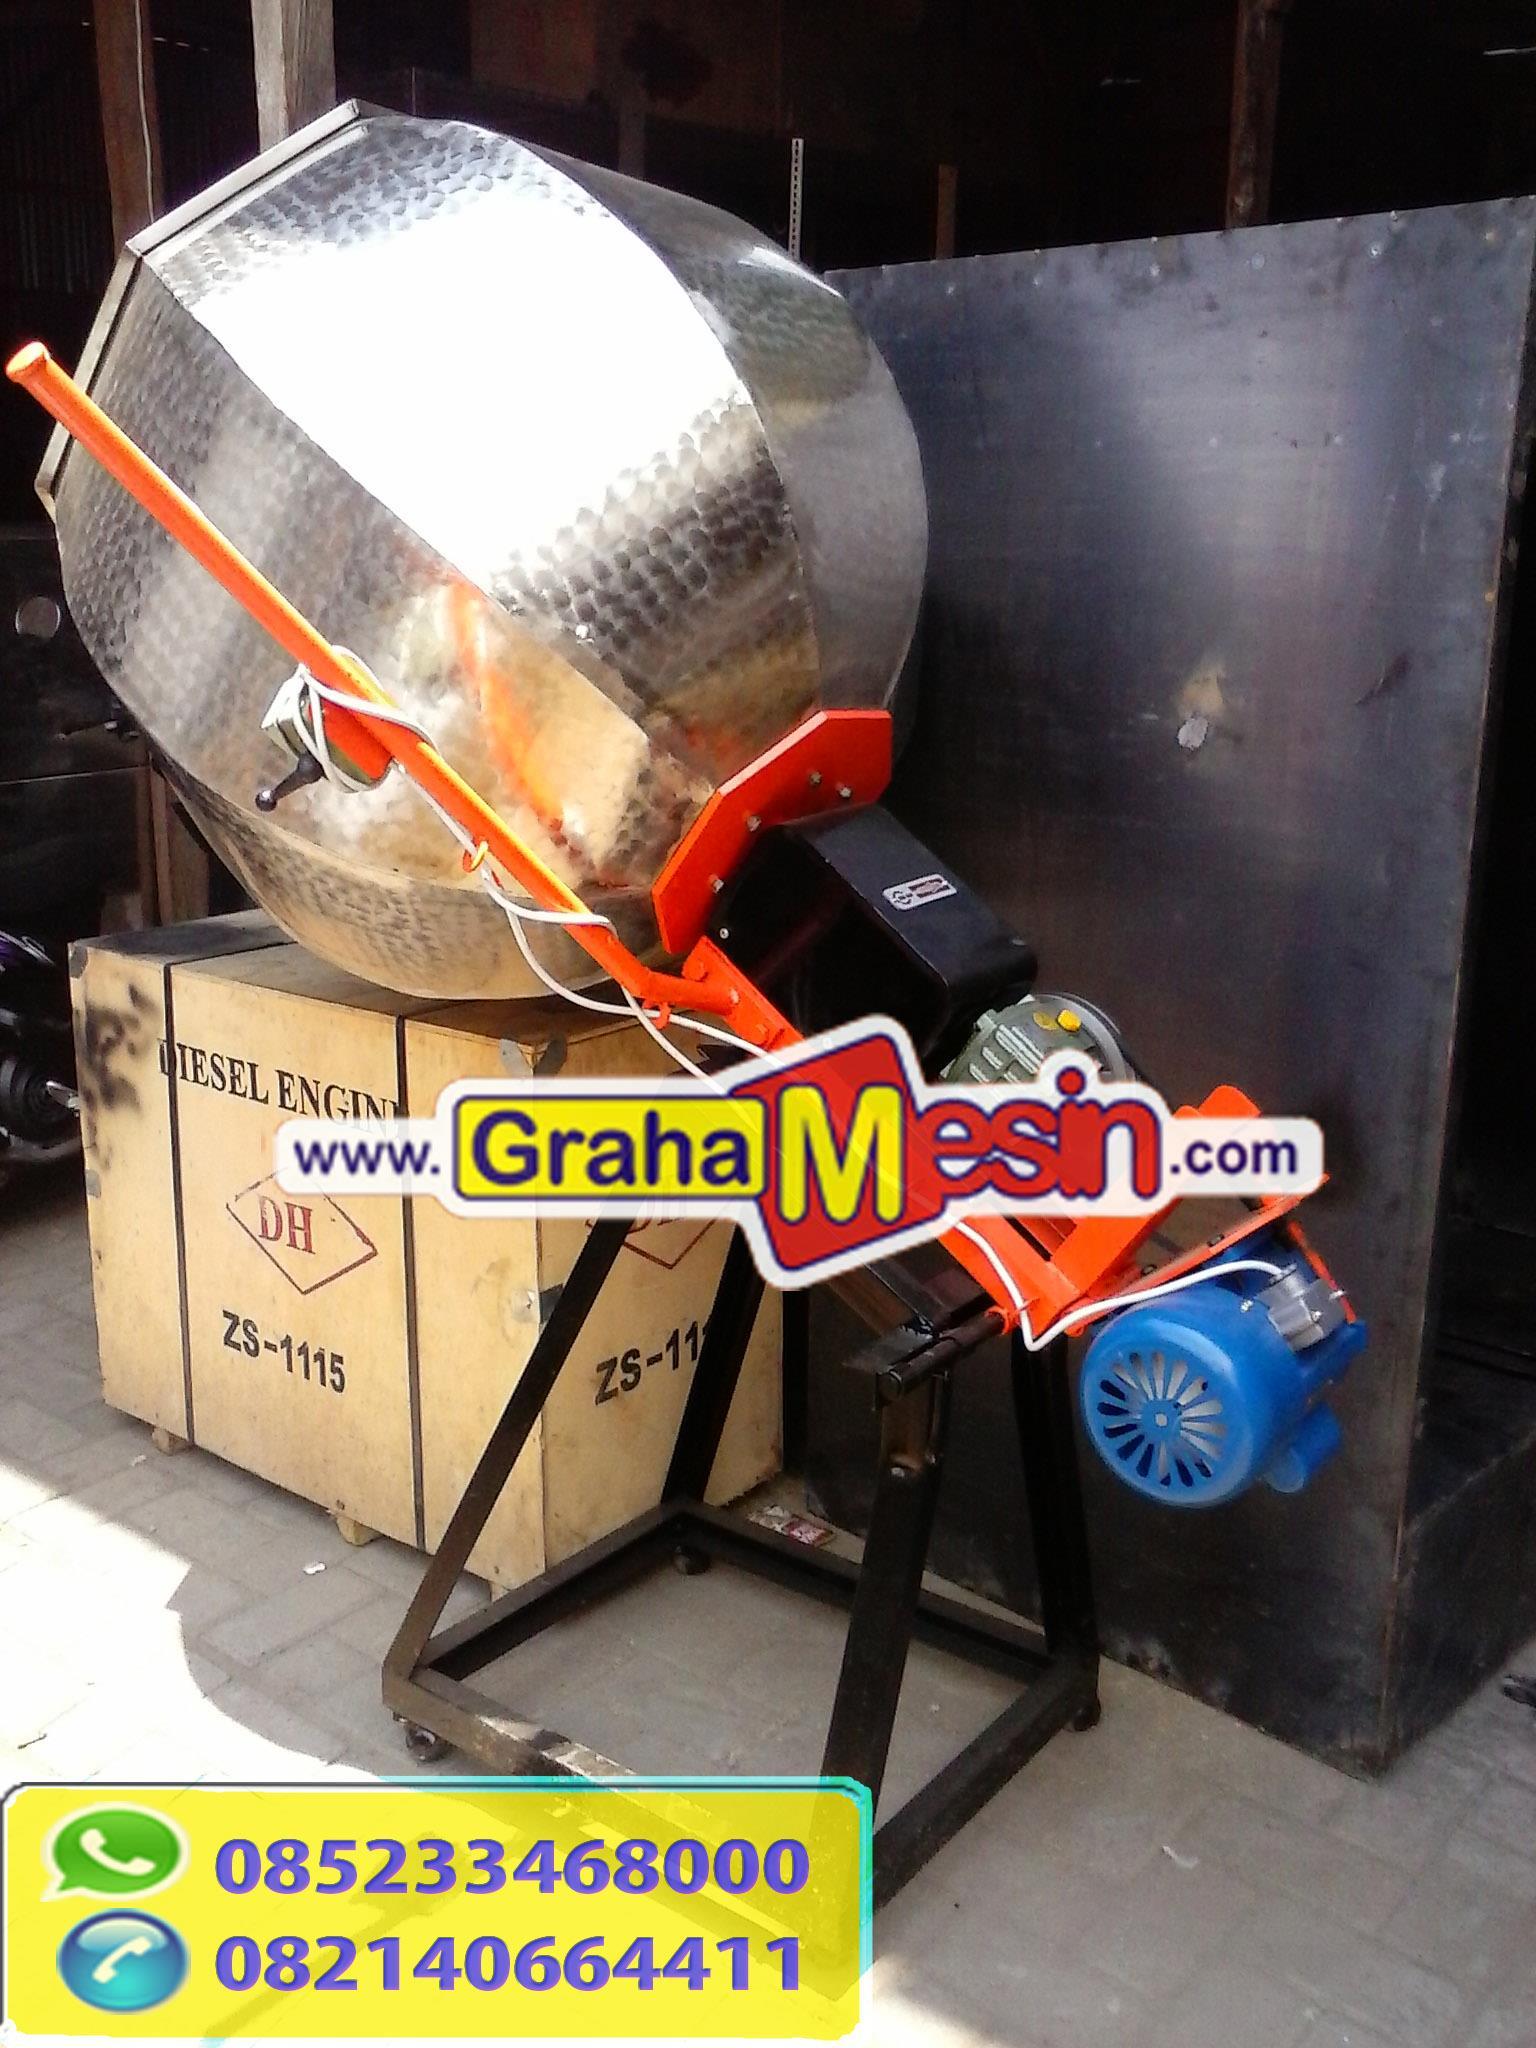 Sell Versatile Seasoning Mixer Machine From Indonesia By Cv Graha Van Belt Utk Mesin Steam Globalindocheap Price